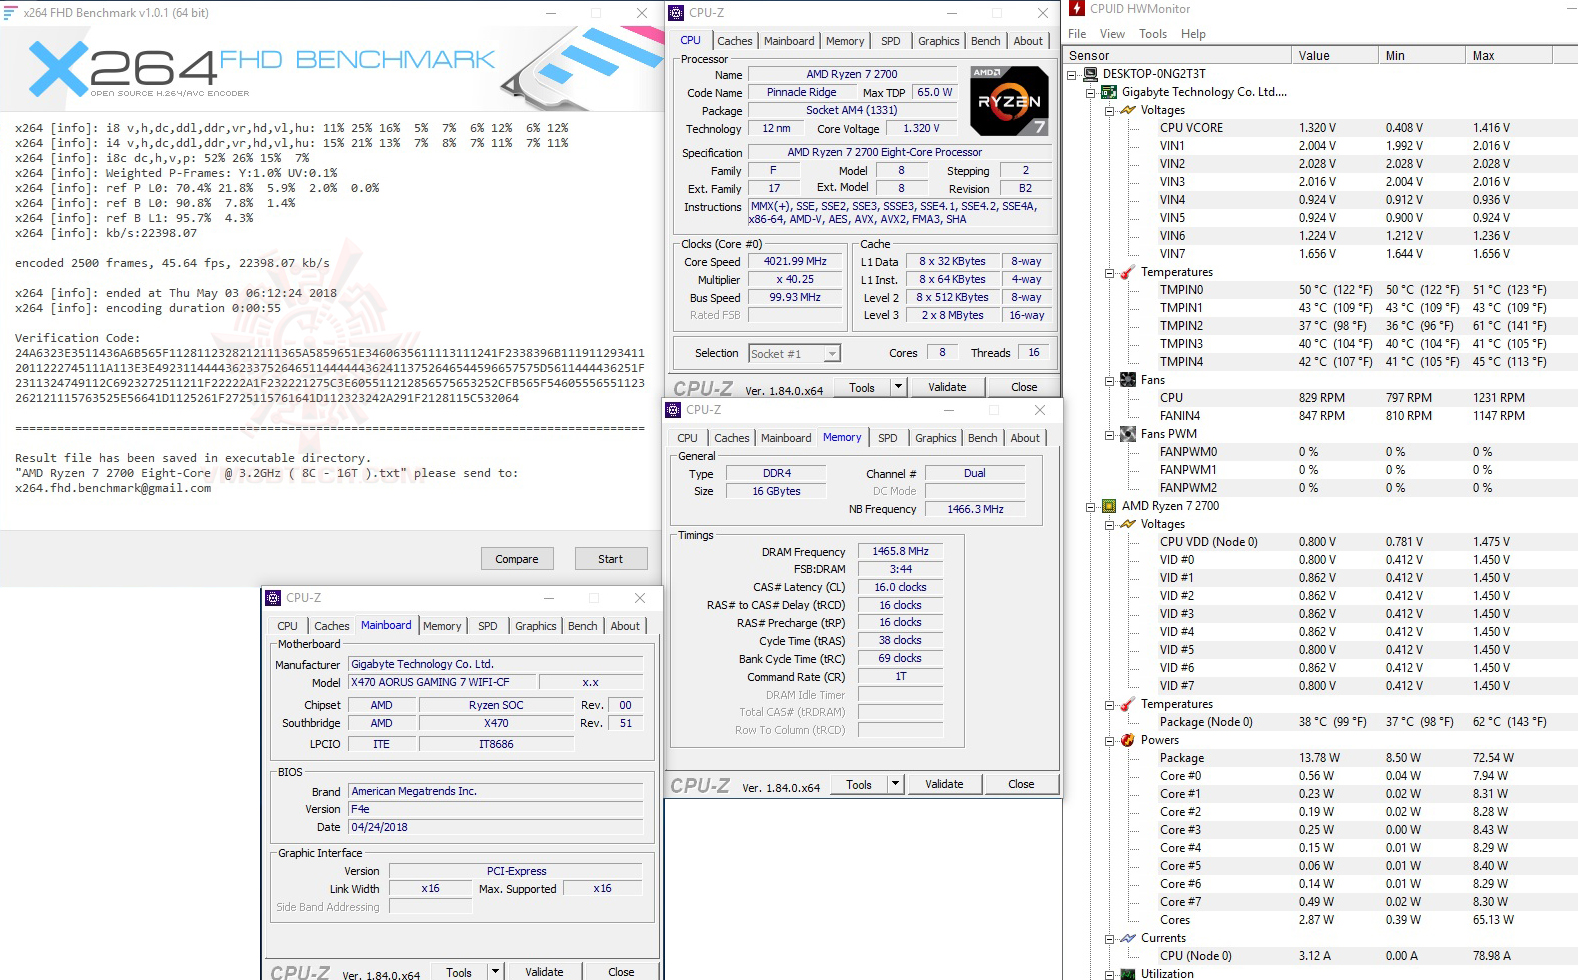 x264 1 AMD RYZEN 7 2700 and StoreMI Technology Review